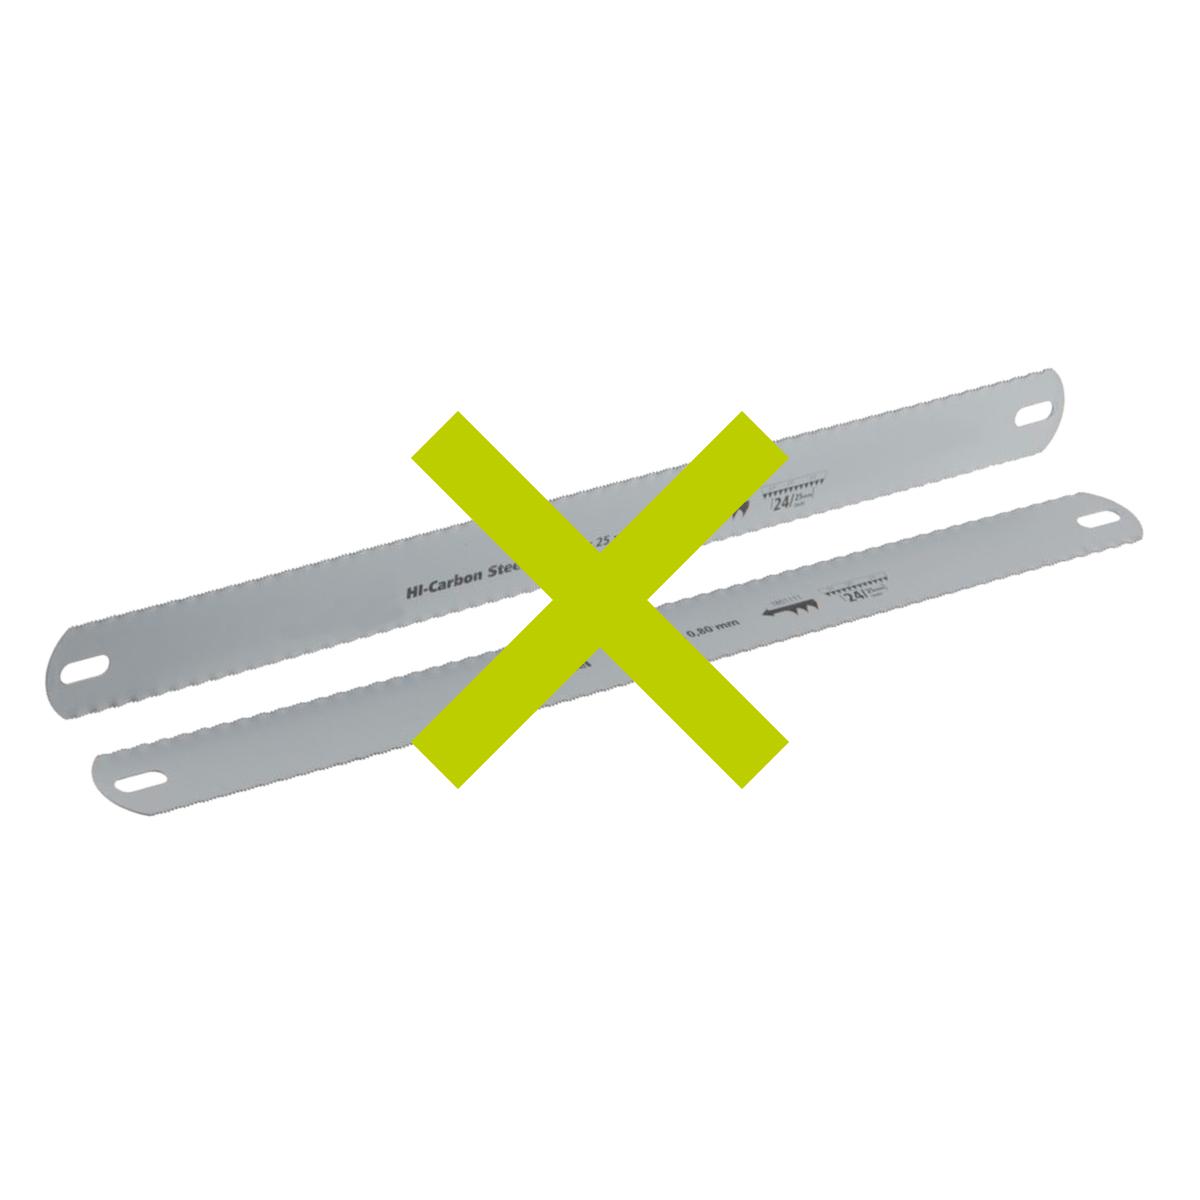 Profilitec | FAQ | Stainless Steel precautions